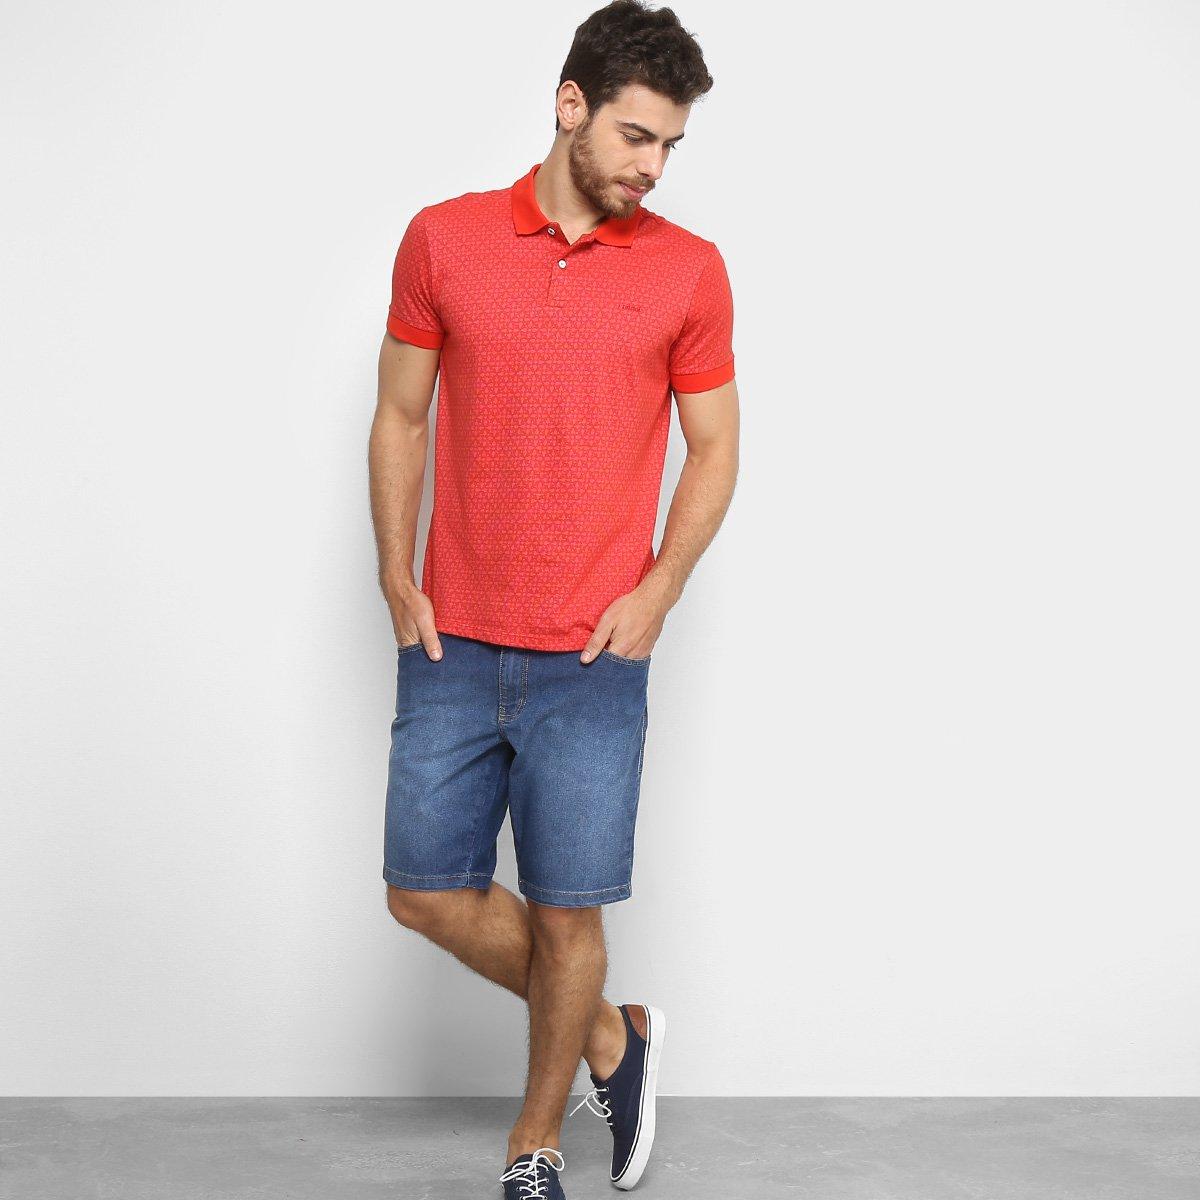 Camisa Polo Estampada Colcci Manga Curta Masculina - Vermelho ... 8bb01e009bc1e